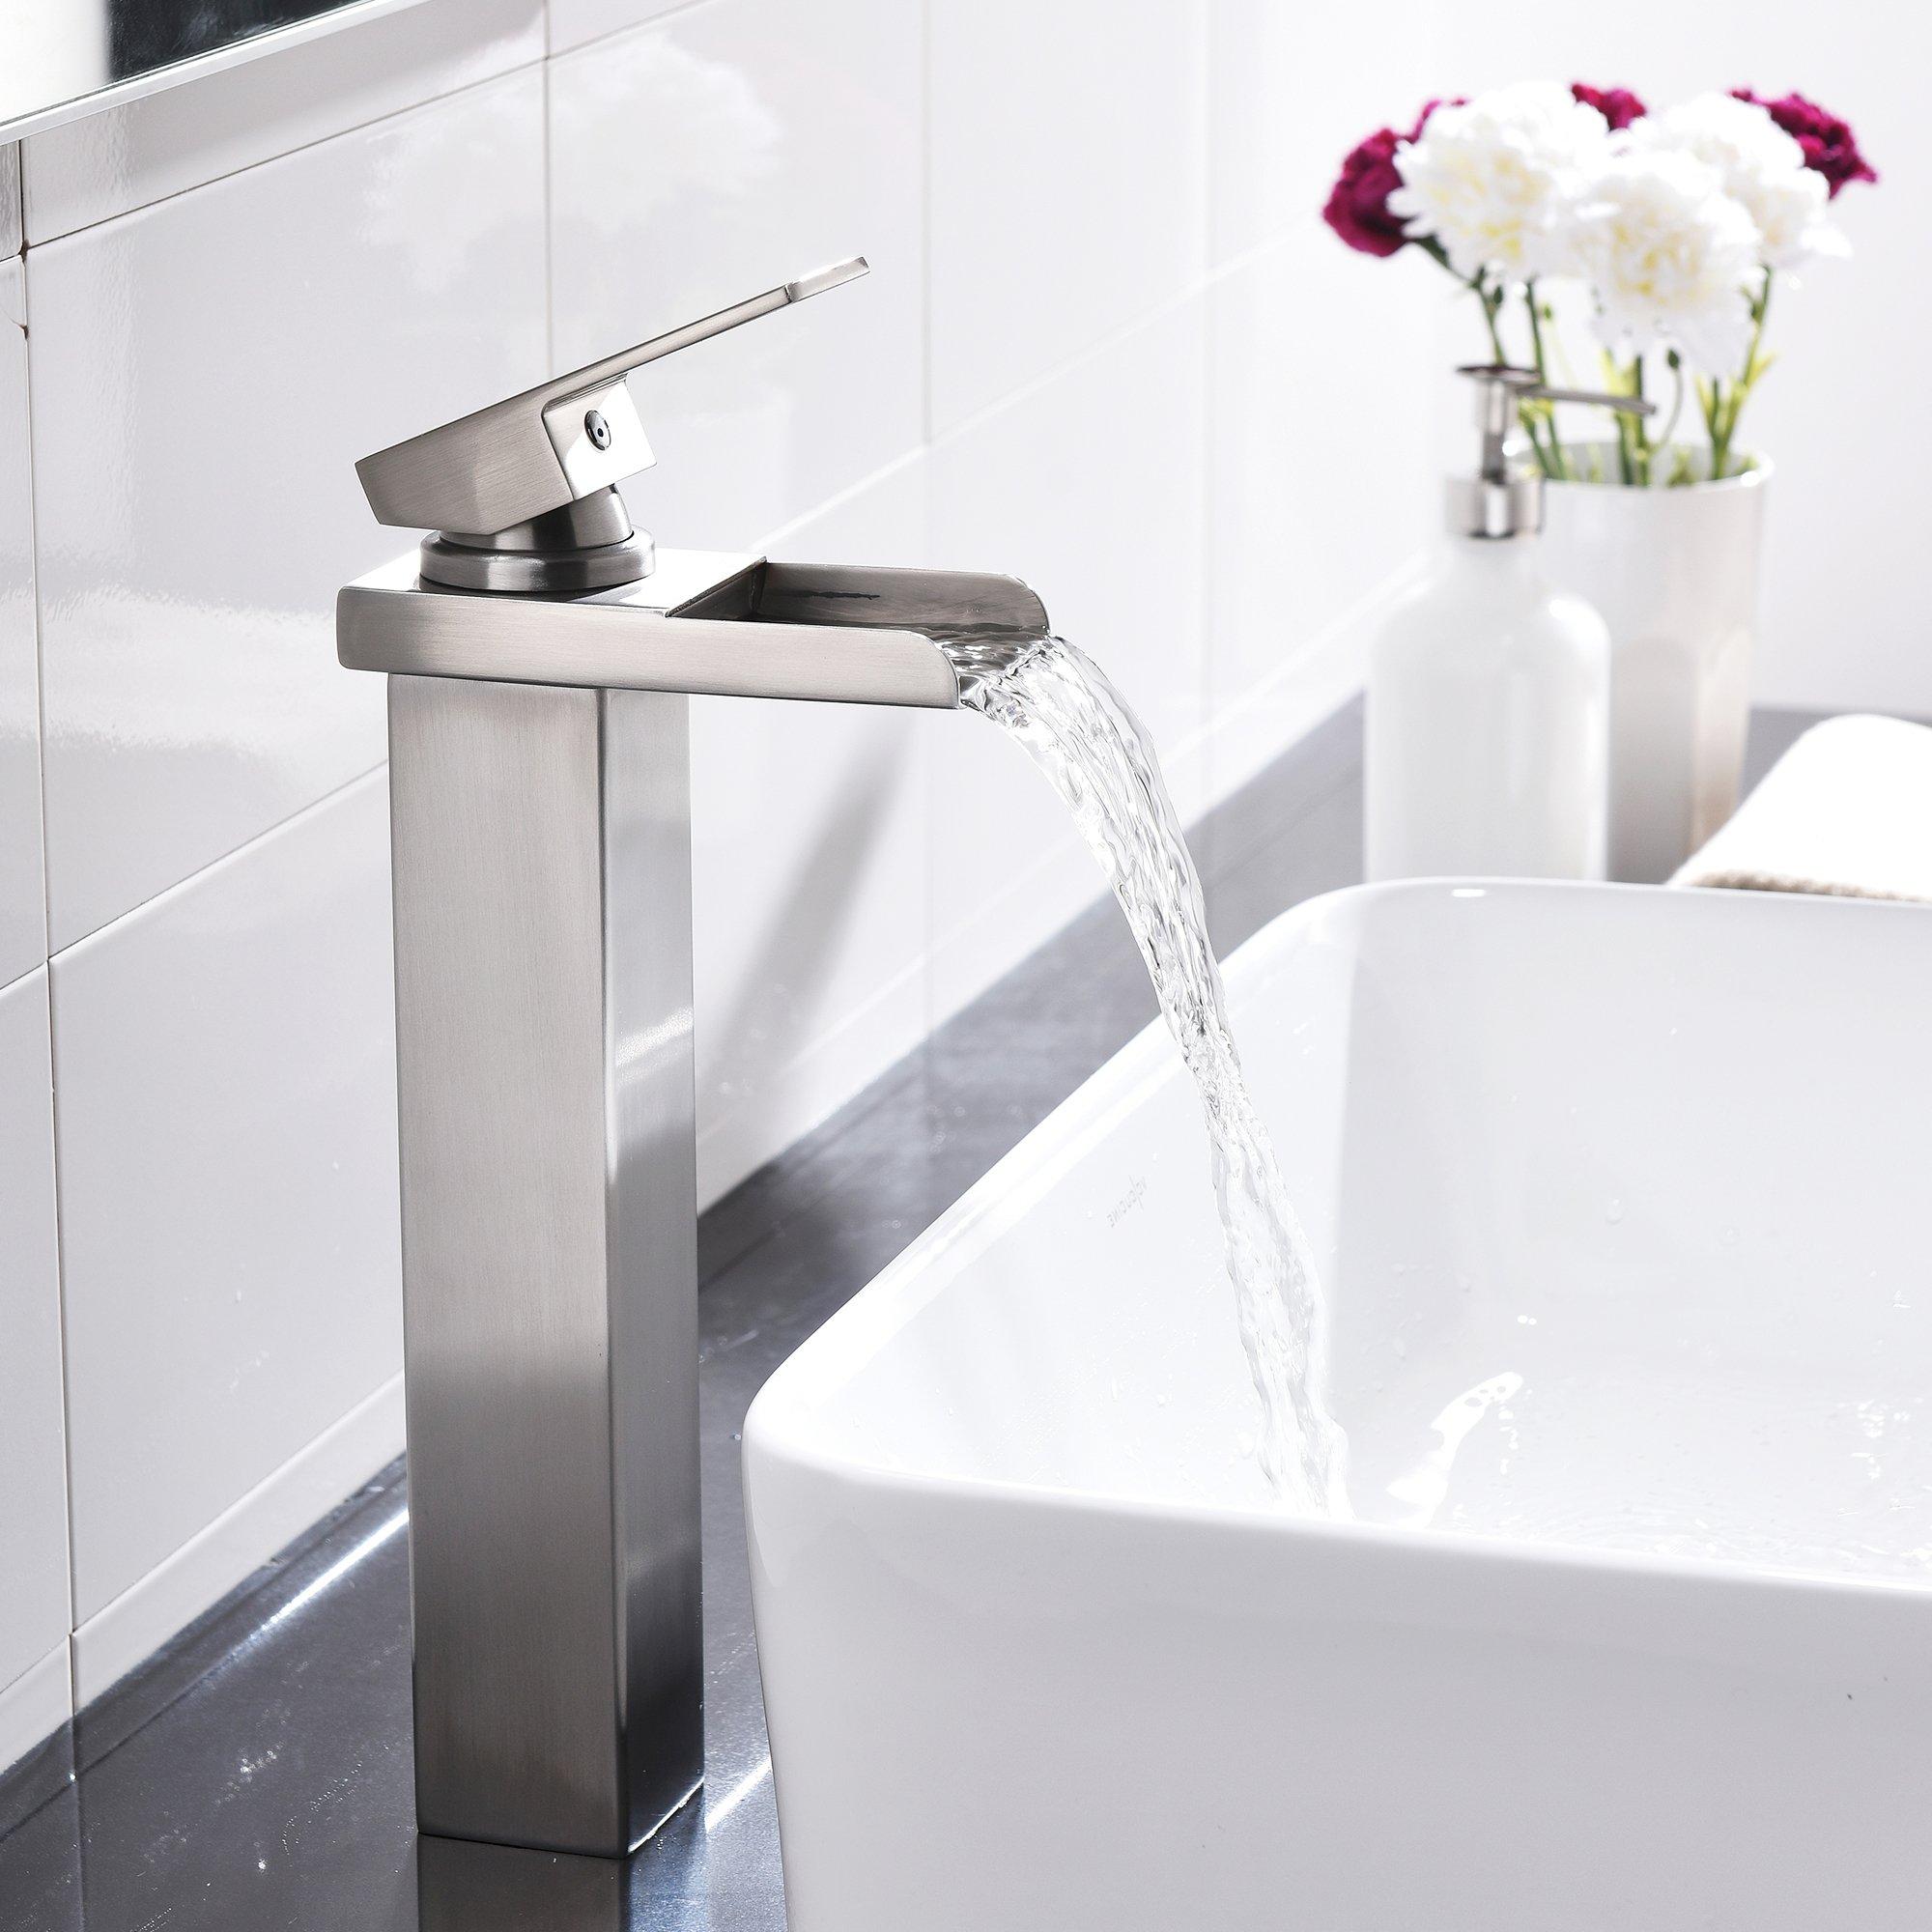 Comllen Waterfall Spout Single Handle Lever Bathroom Vessel Sink Faucet, Brushed Nickel